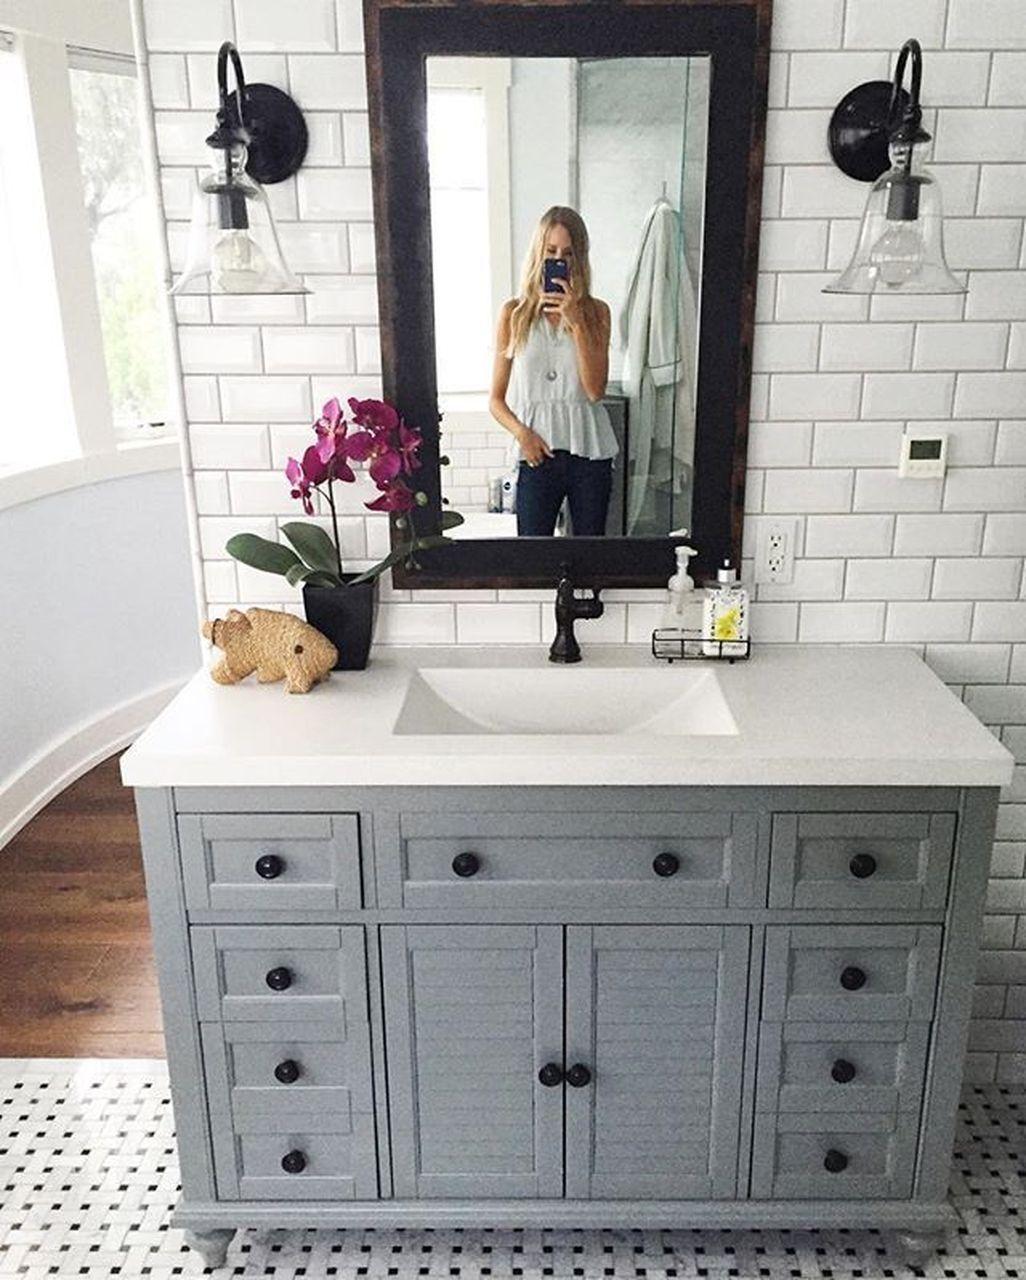 46 Fabulous Country Kitchen Designs Ideas: 40 Popular Farmhouse Bathroom Vanity Ideas